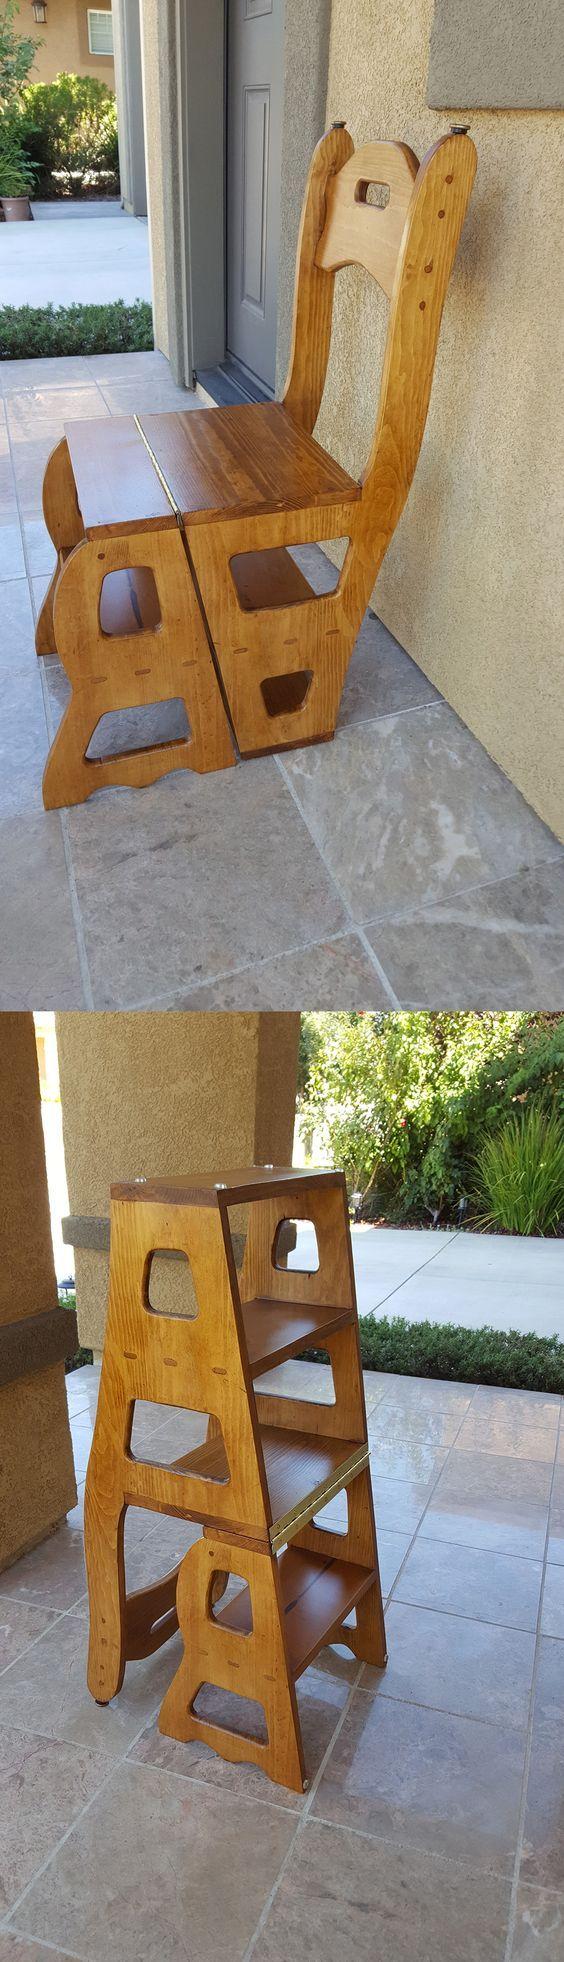 Best 25 Kitchen Chairs Ideas On Pinterest White Wood